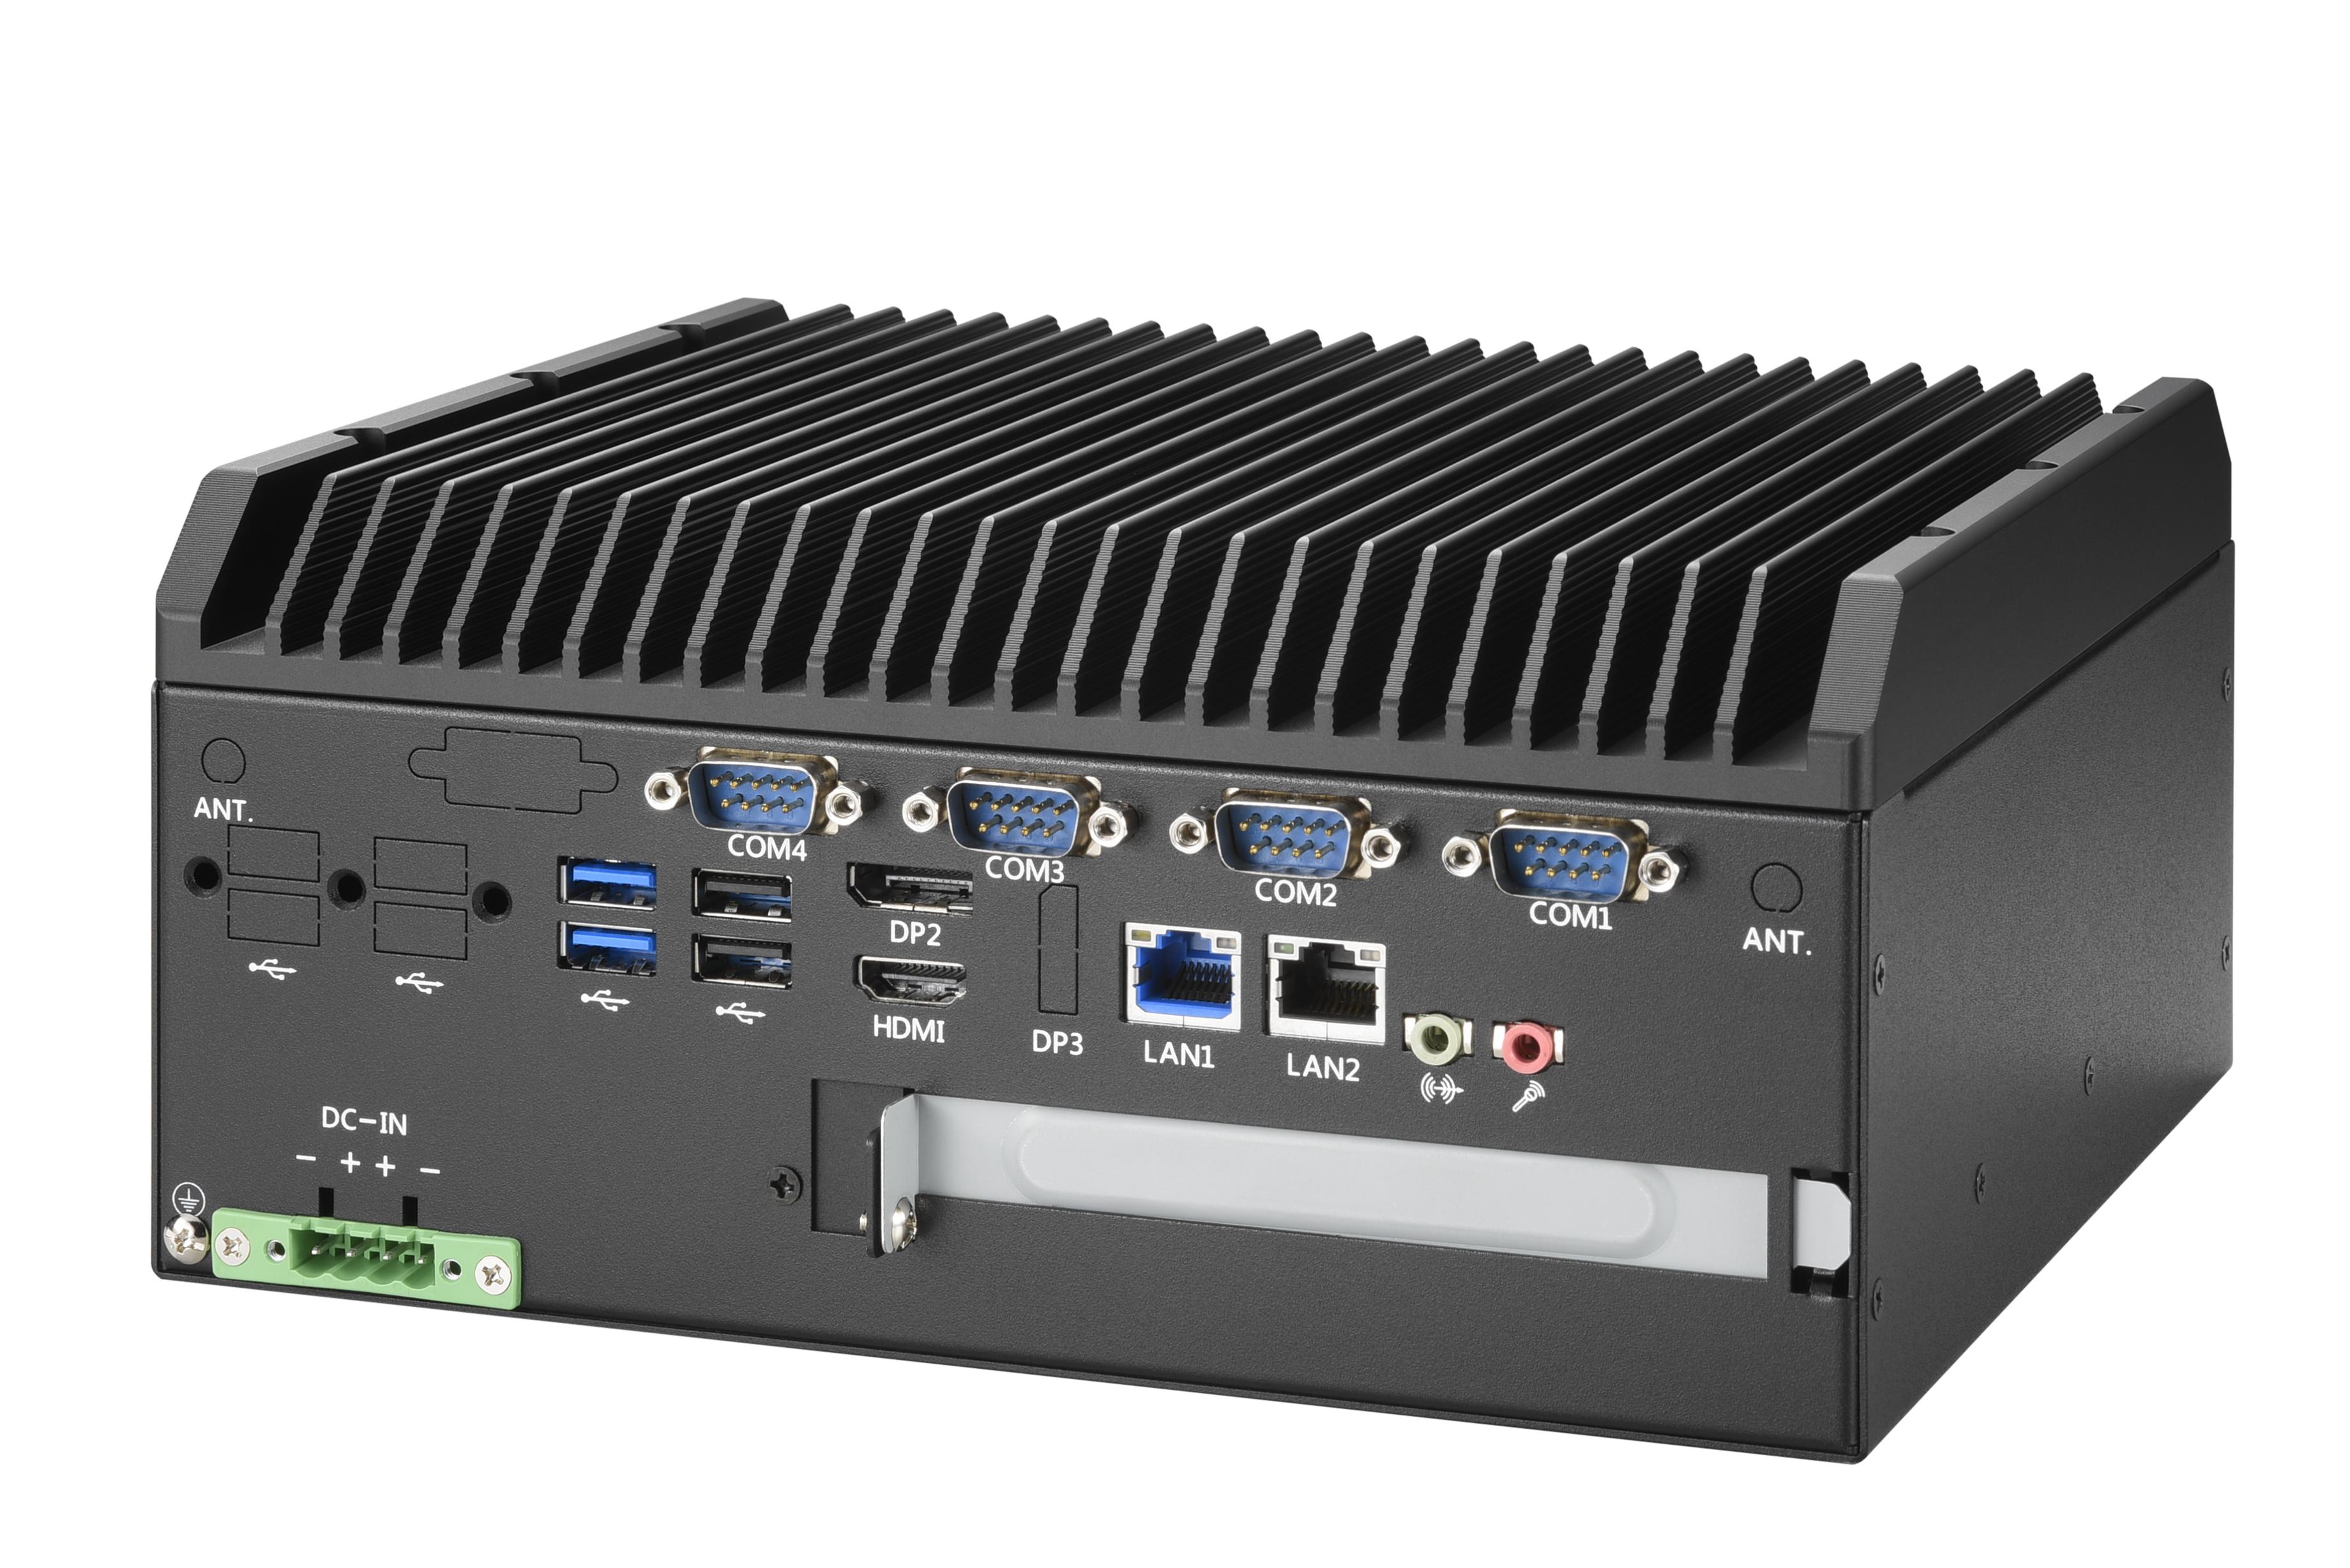 fanlessboxpc AIS-3023 Intel 10th Comet Lake-S H420E